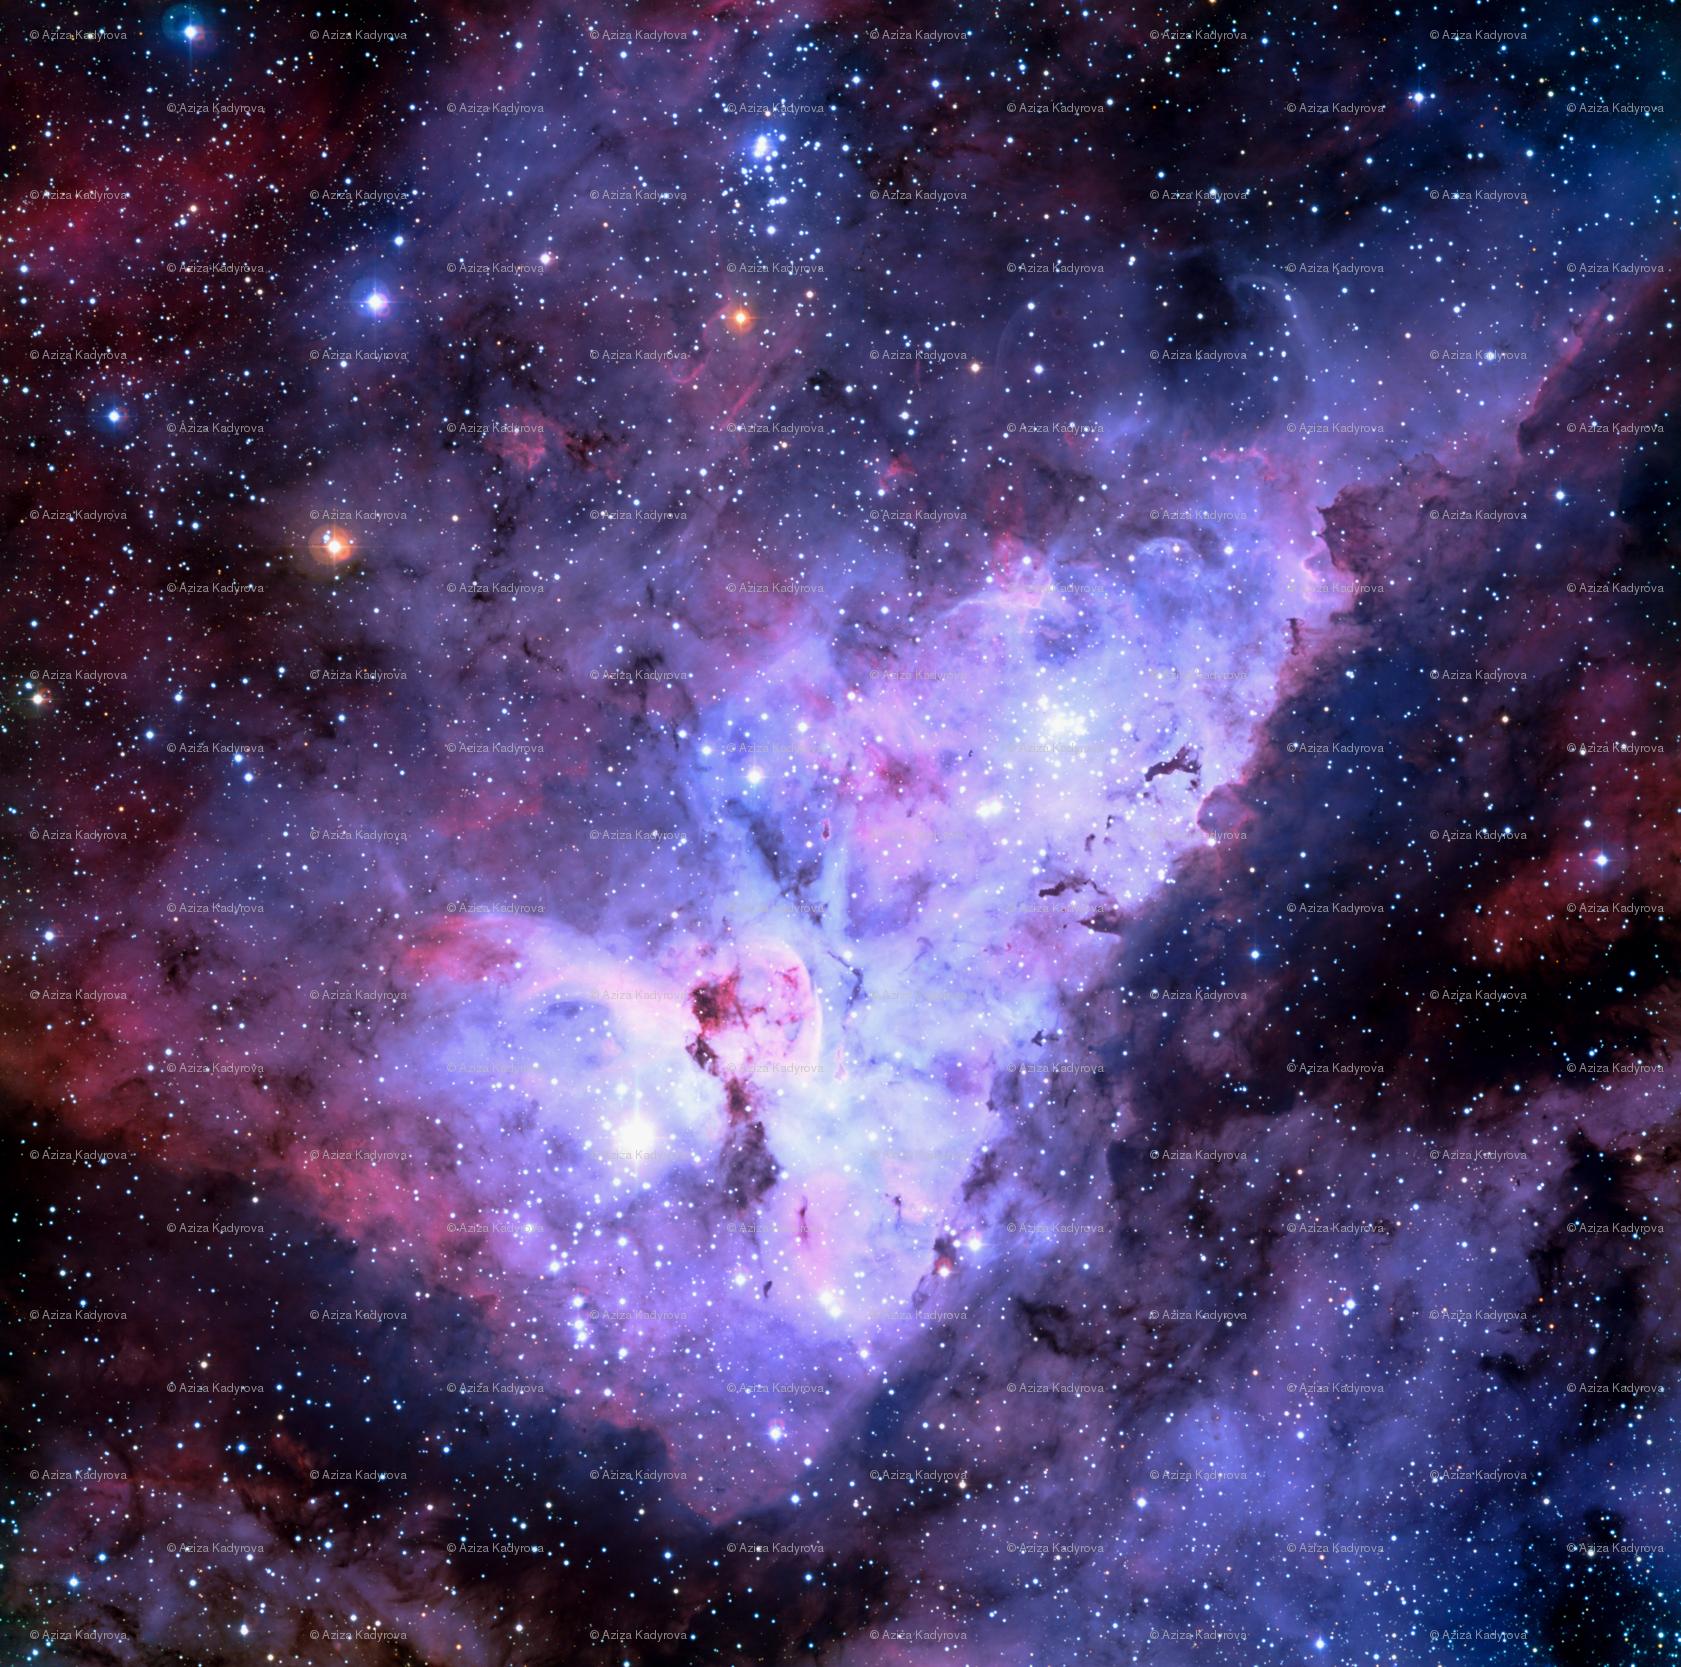 galaxy bedroom wallpaper images